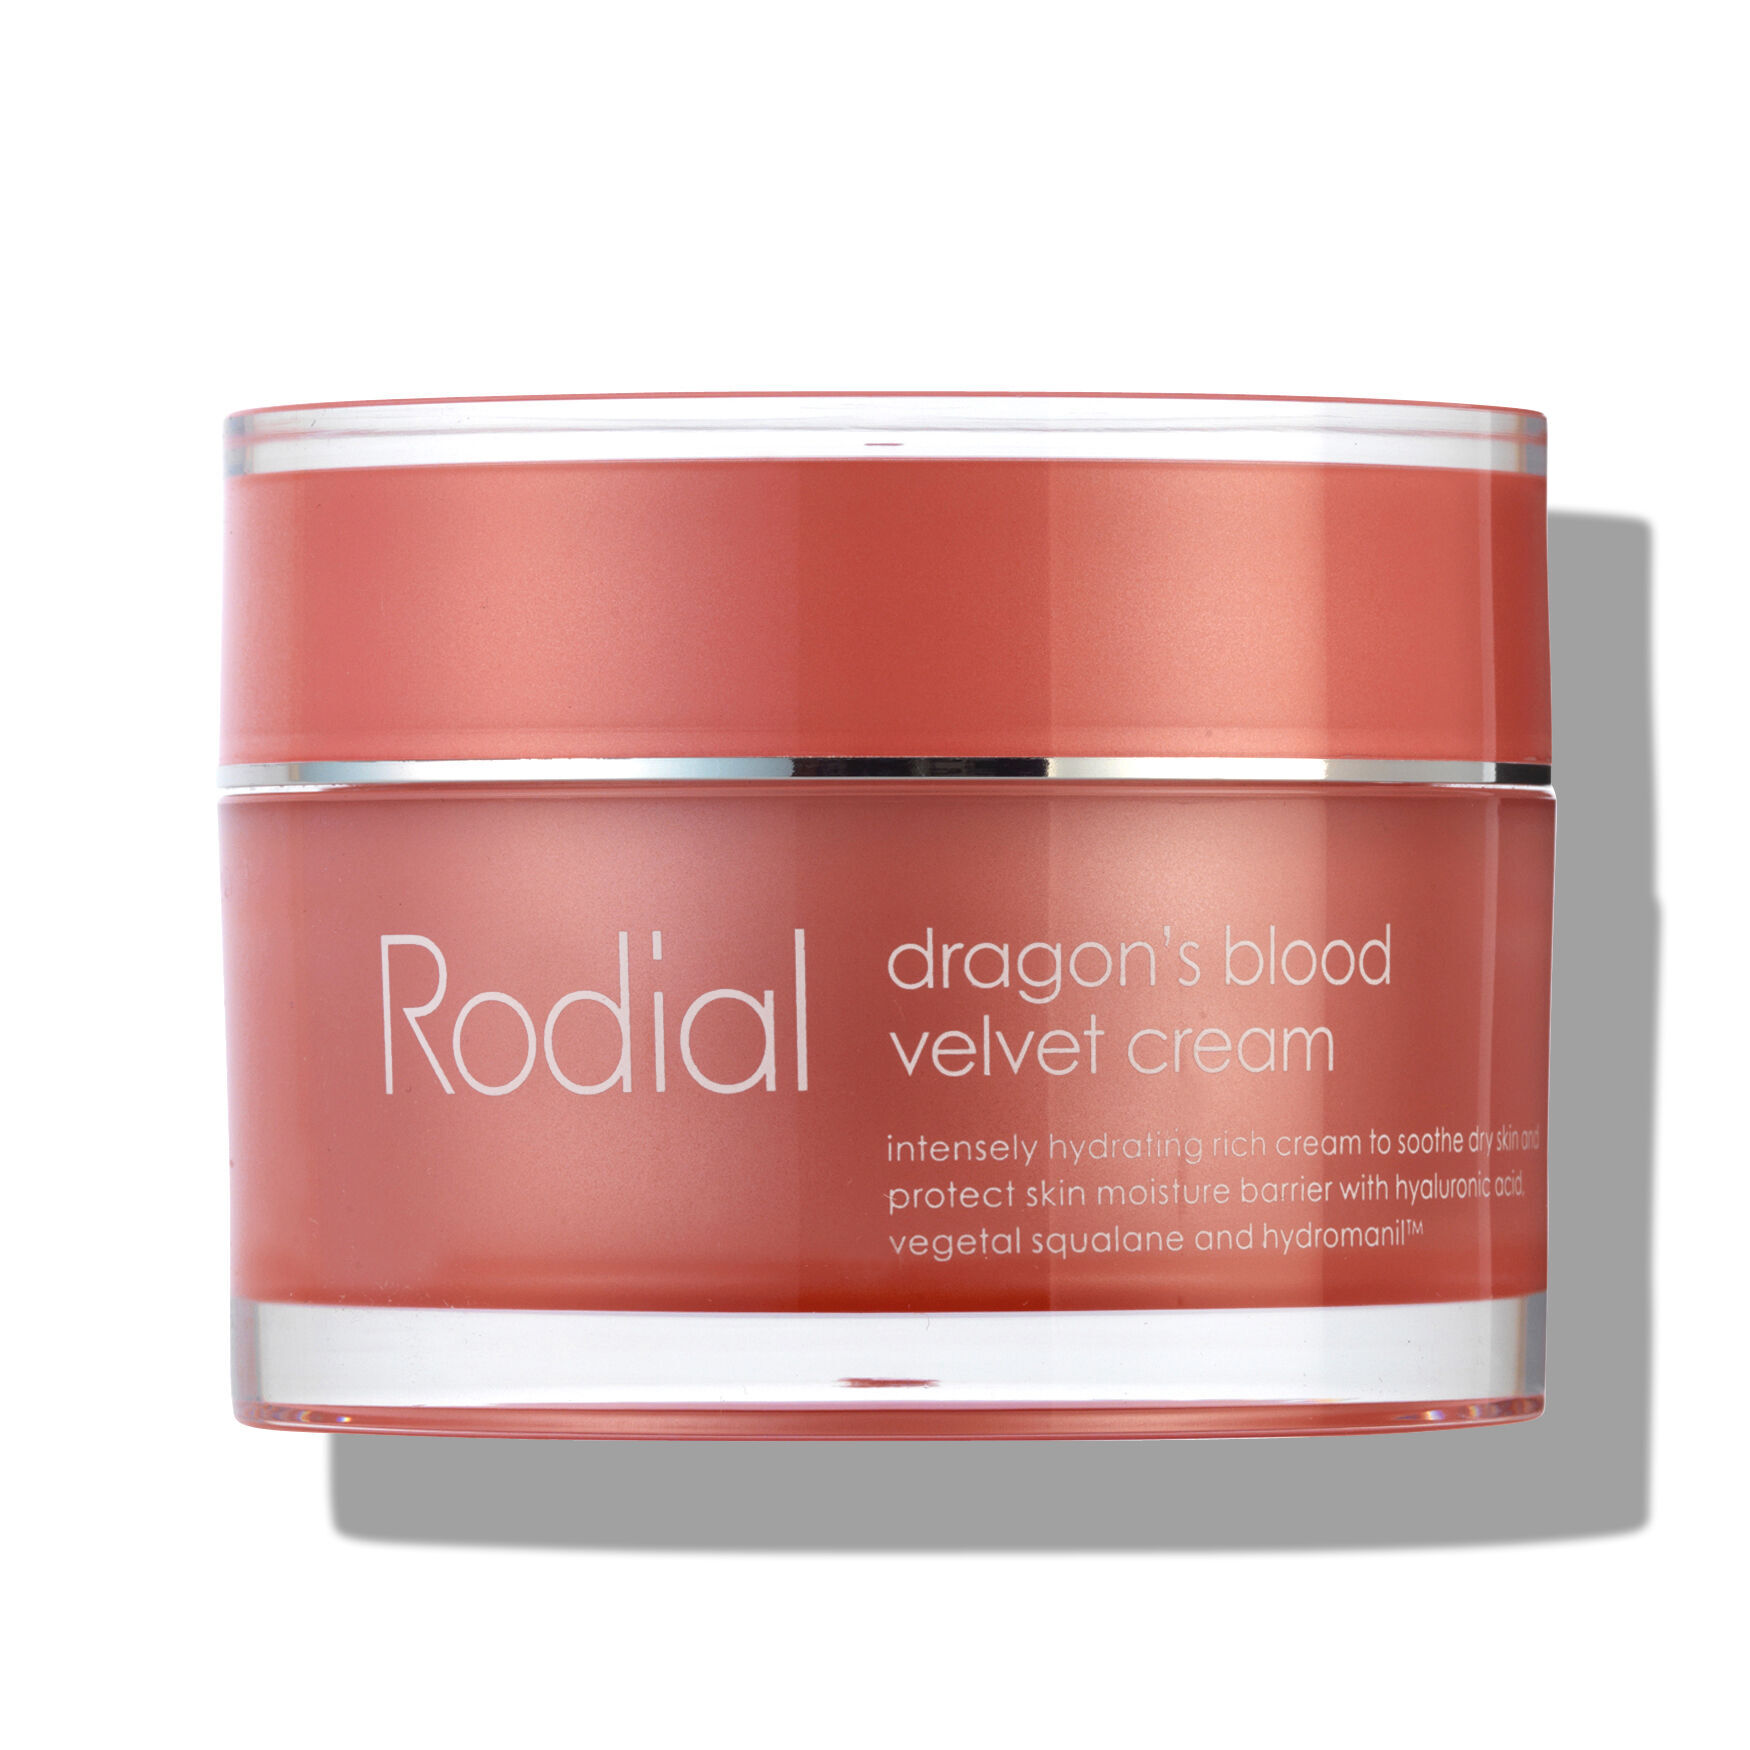 Rodial - Dragon's Blood Velvet Cream by Rodial